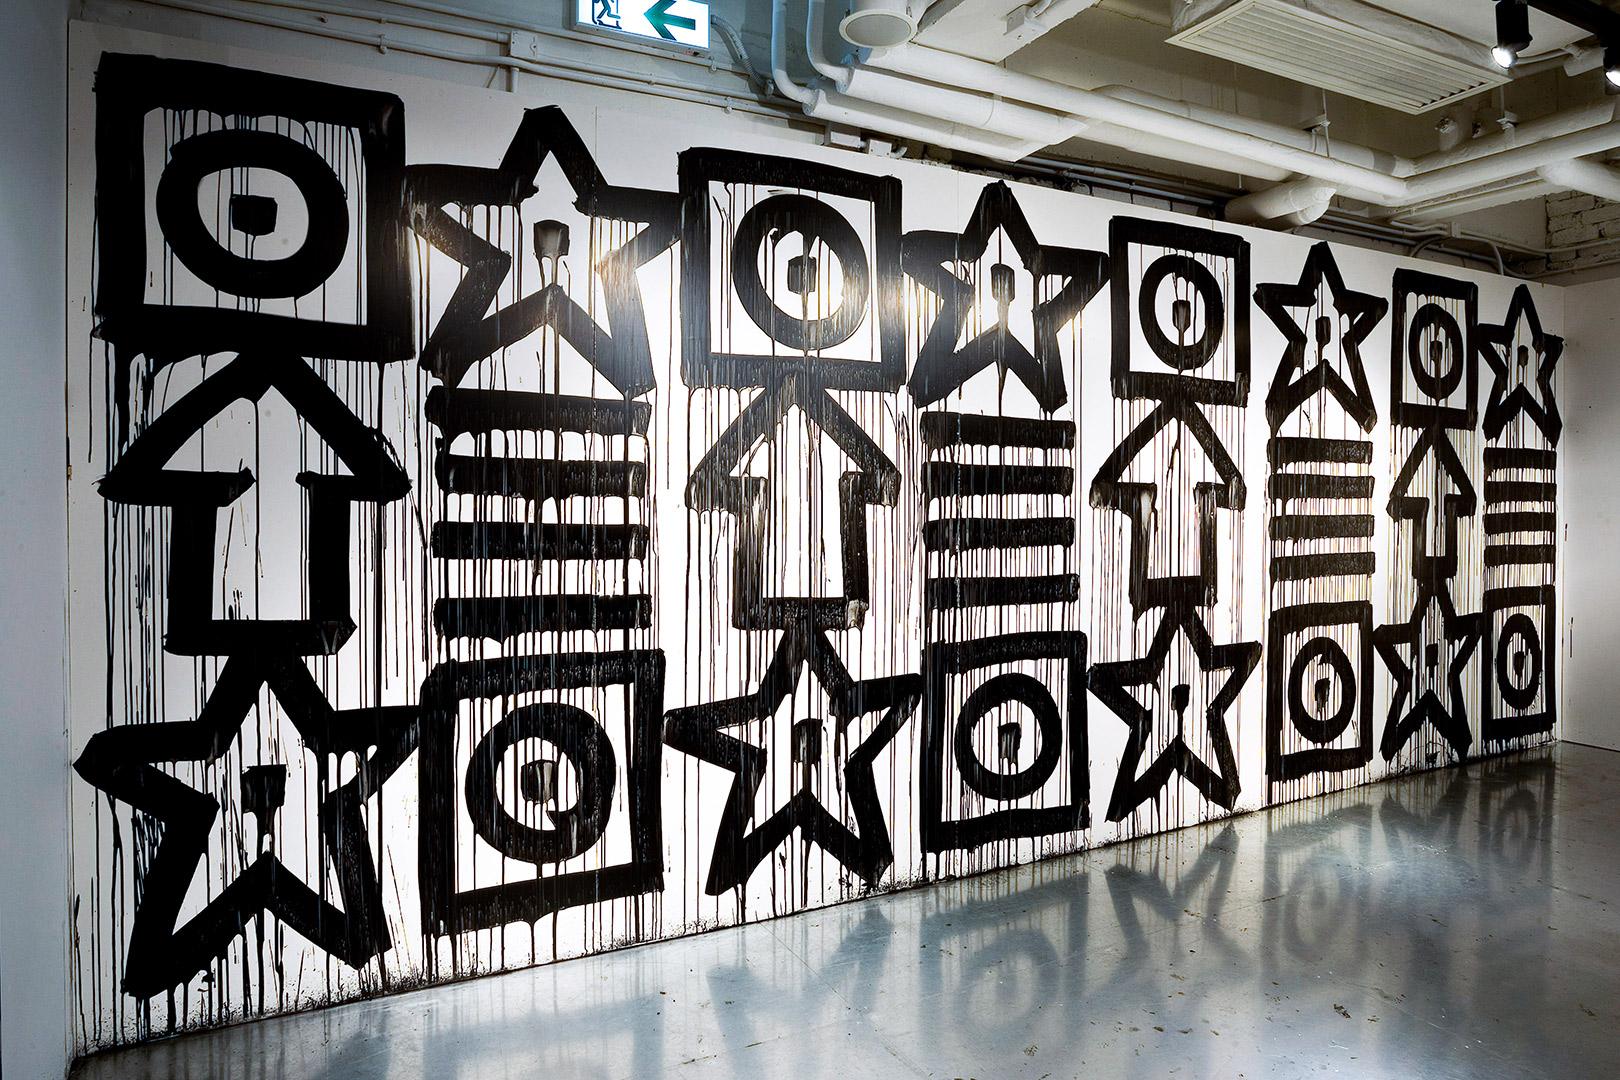 Eric Haze 2008 HOCA installation